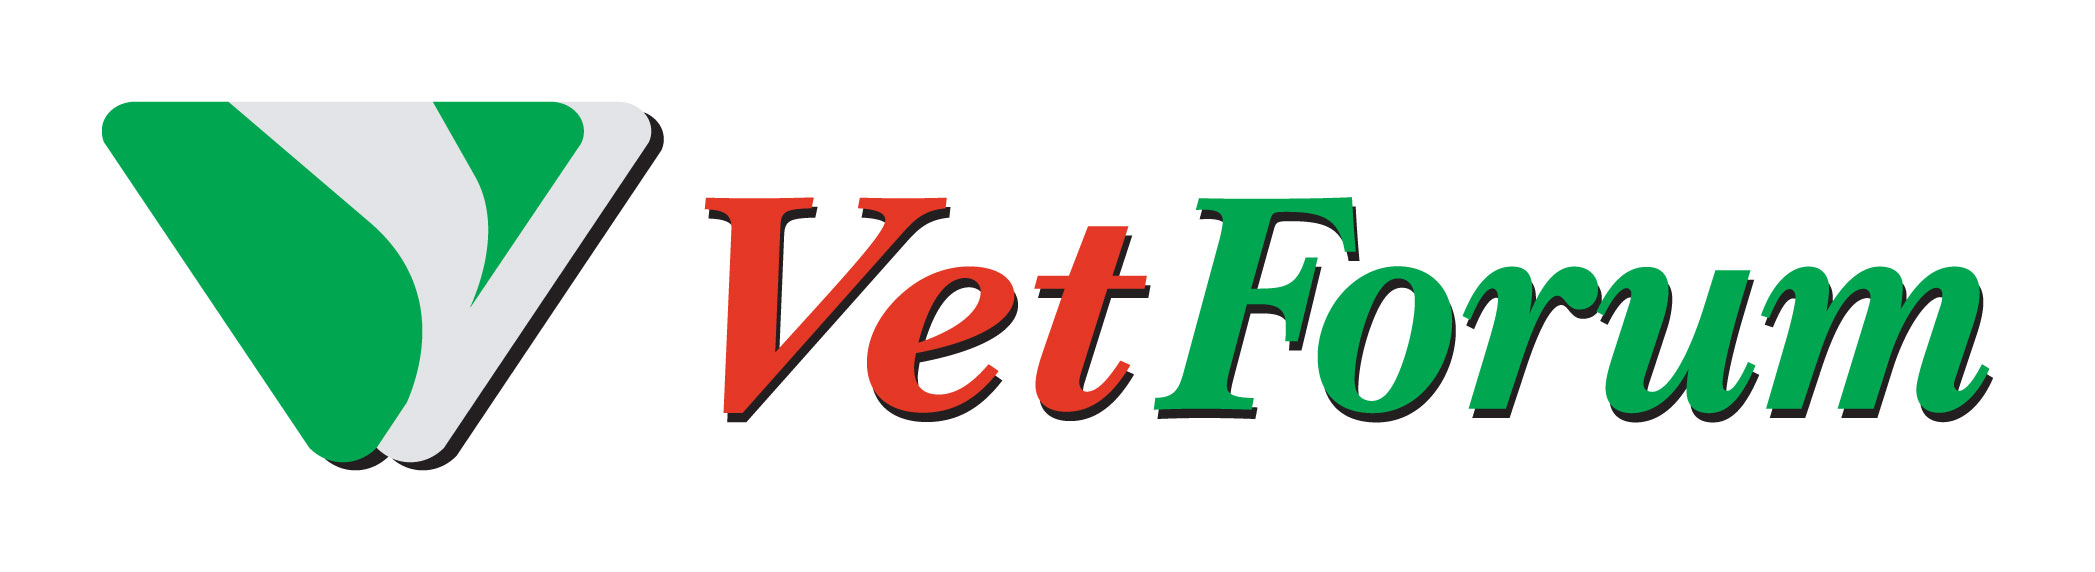 VetForum_logo JPG